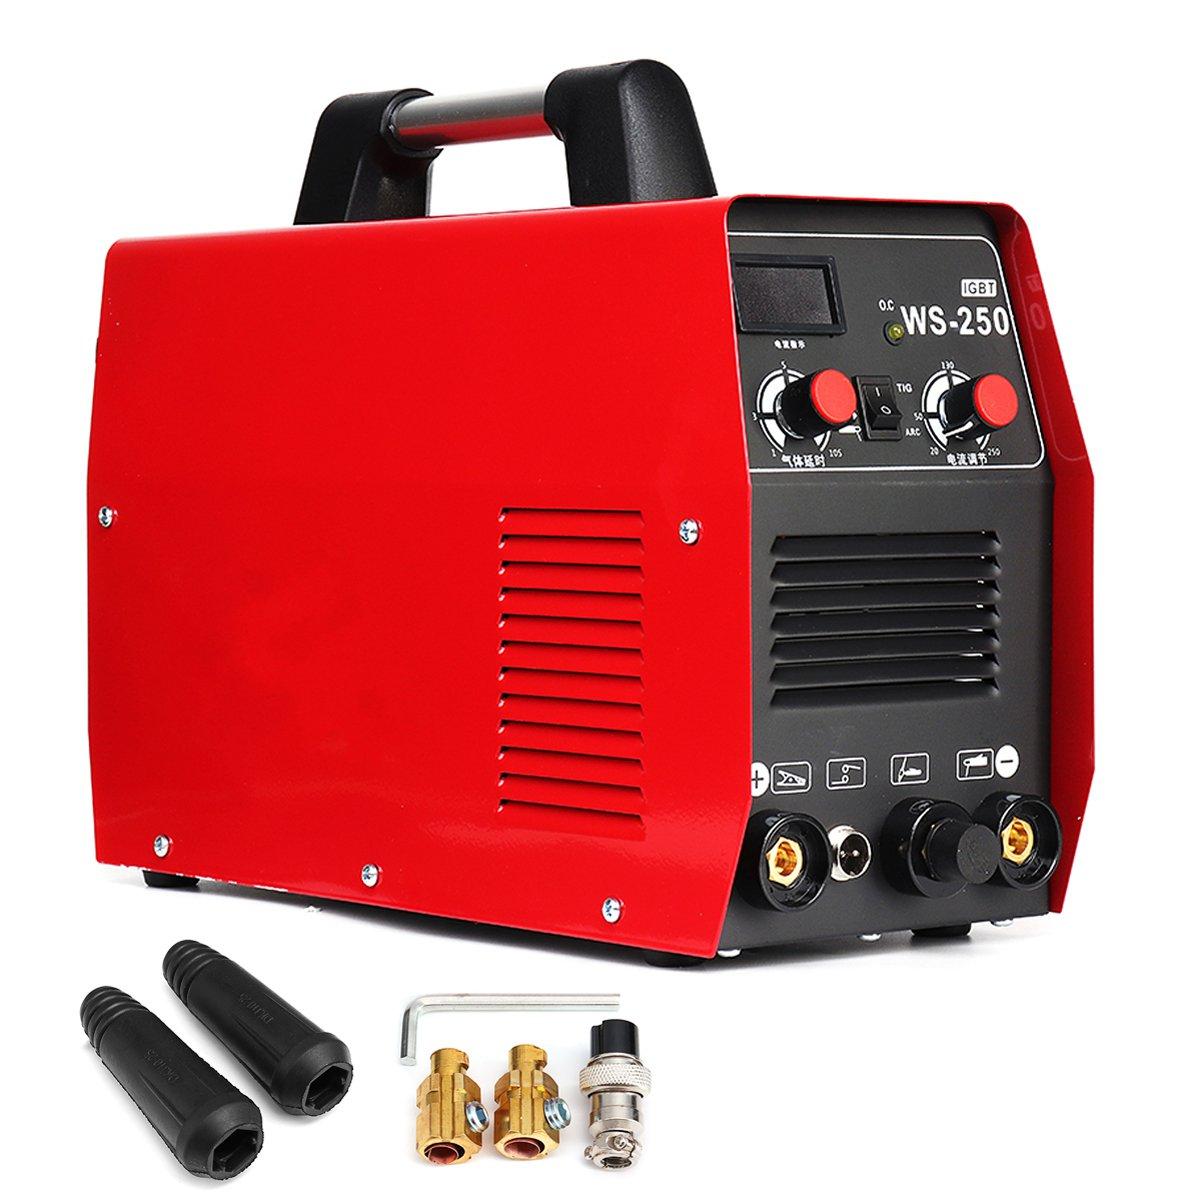 2 in 1 220 v 250A MMA IGBT Bastone Saldatore Inverter Ad Arco di Saldatura Elettrica Macchina per la Saldatura di Lavoro e di Elettrico di lavoro